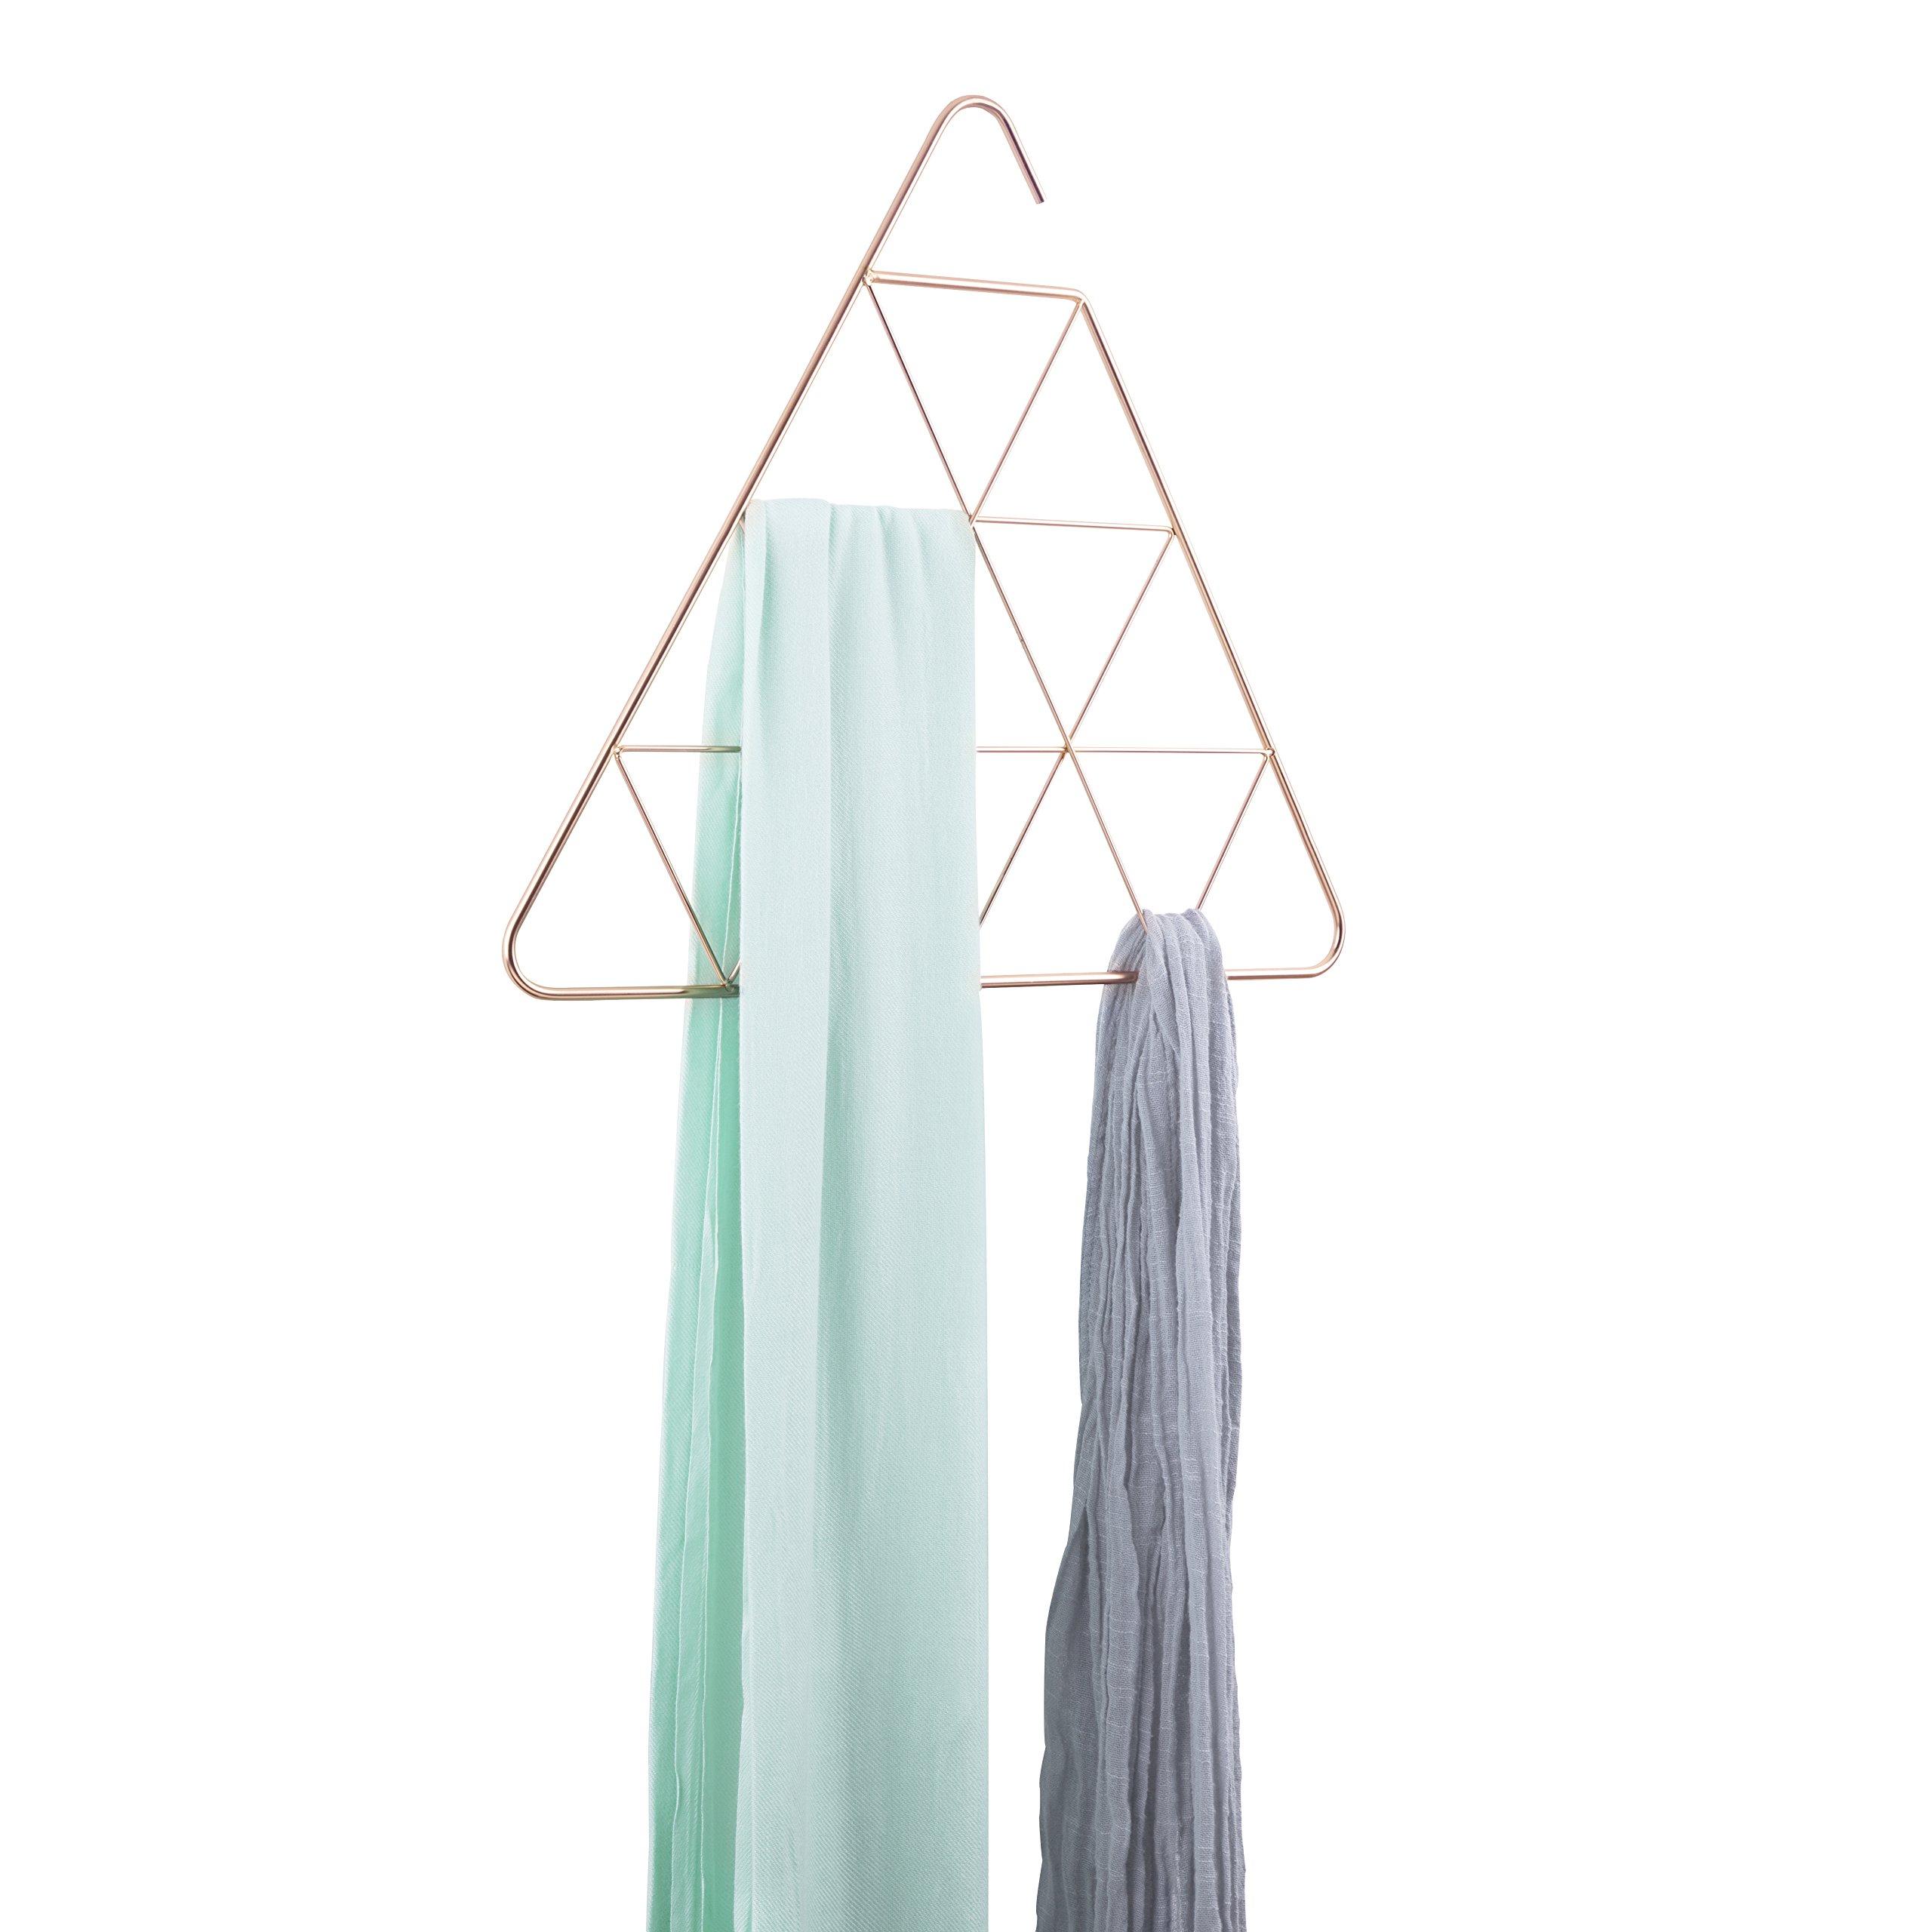 Umbra Pendant Triangular Copper Scarf Hanger/Accessory Hanger, Copper by Umbra (Image #3)